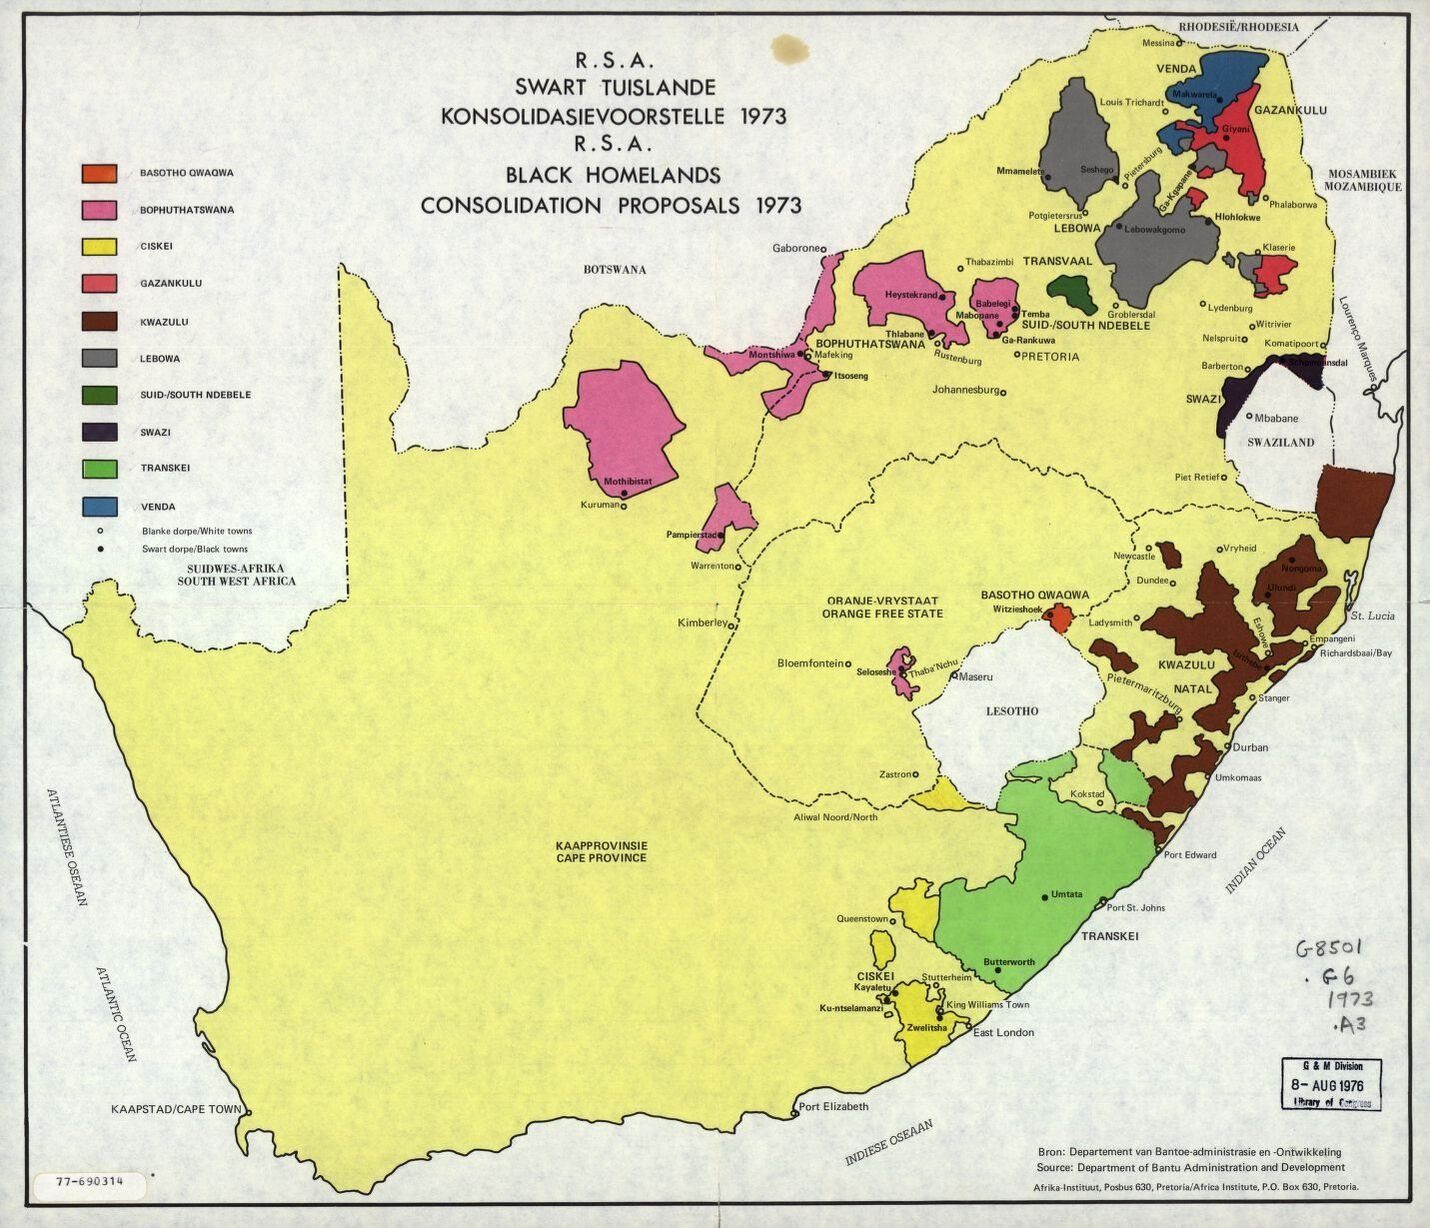 R.S.A. black homelands consolidation proposals, 1973